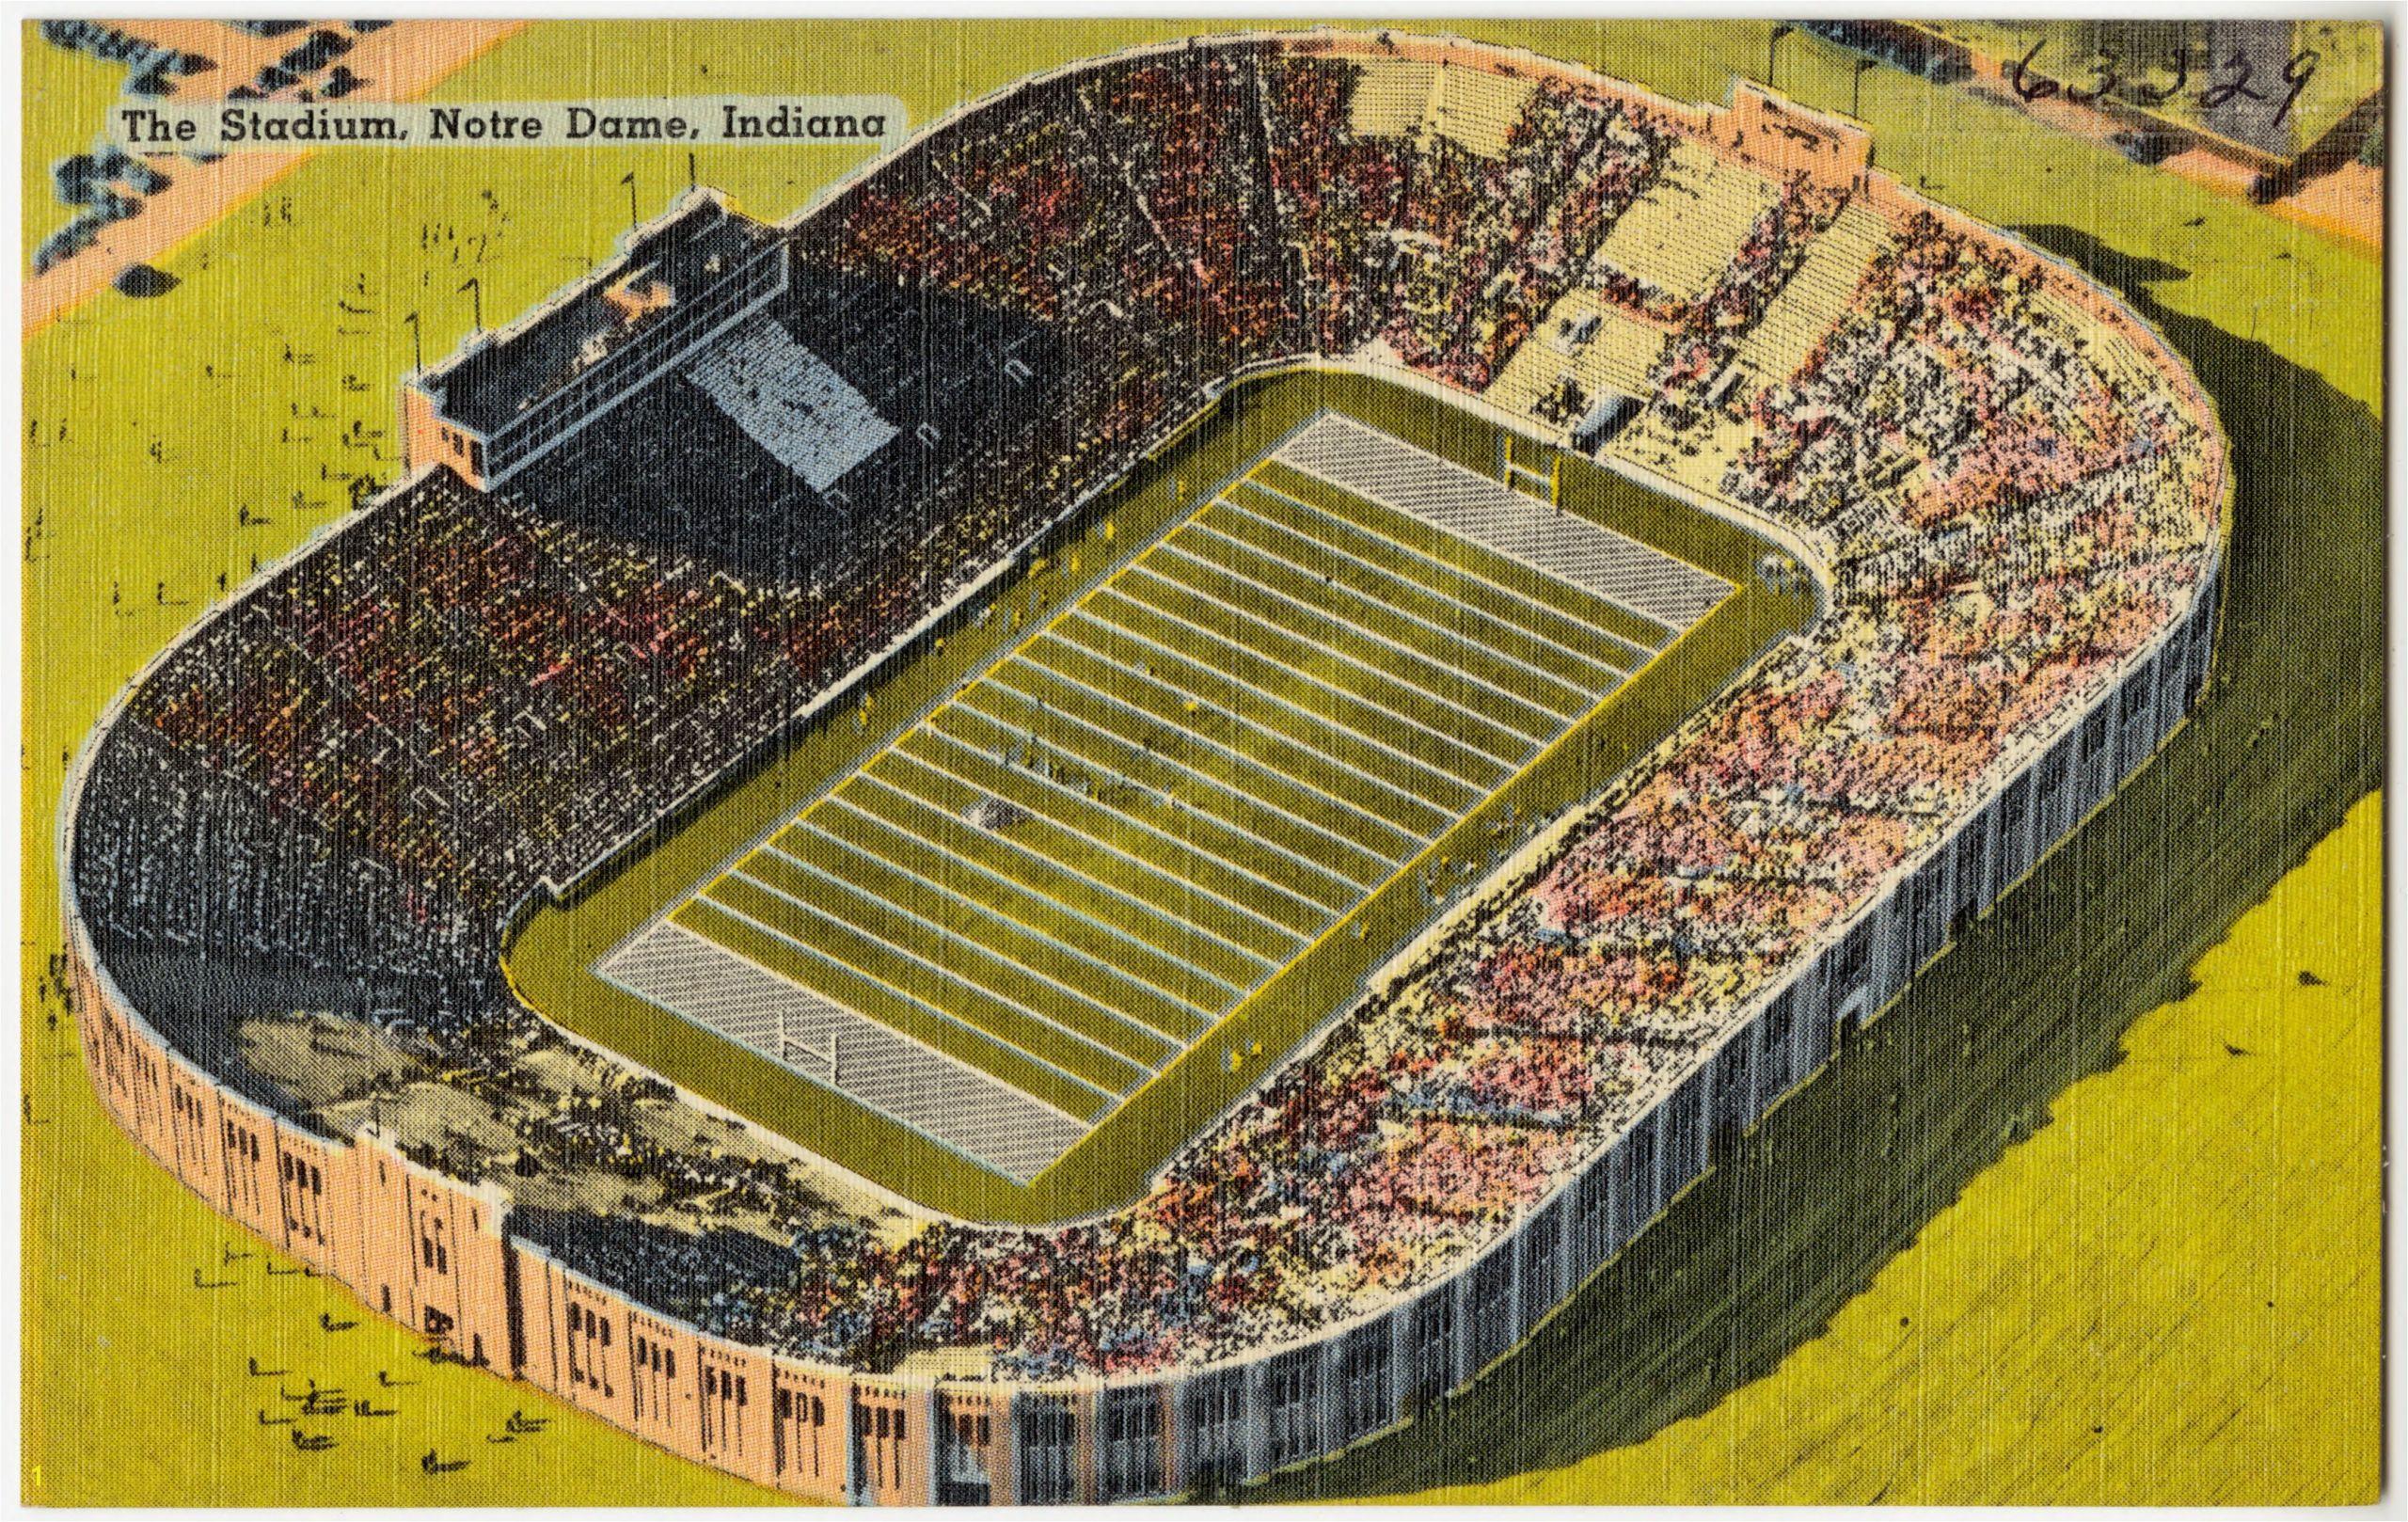 The Stadium Notre Dame Indiana %